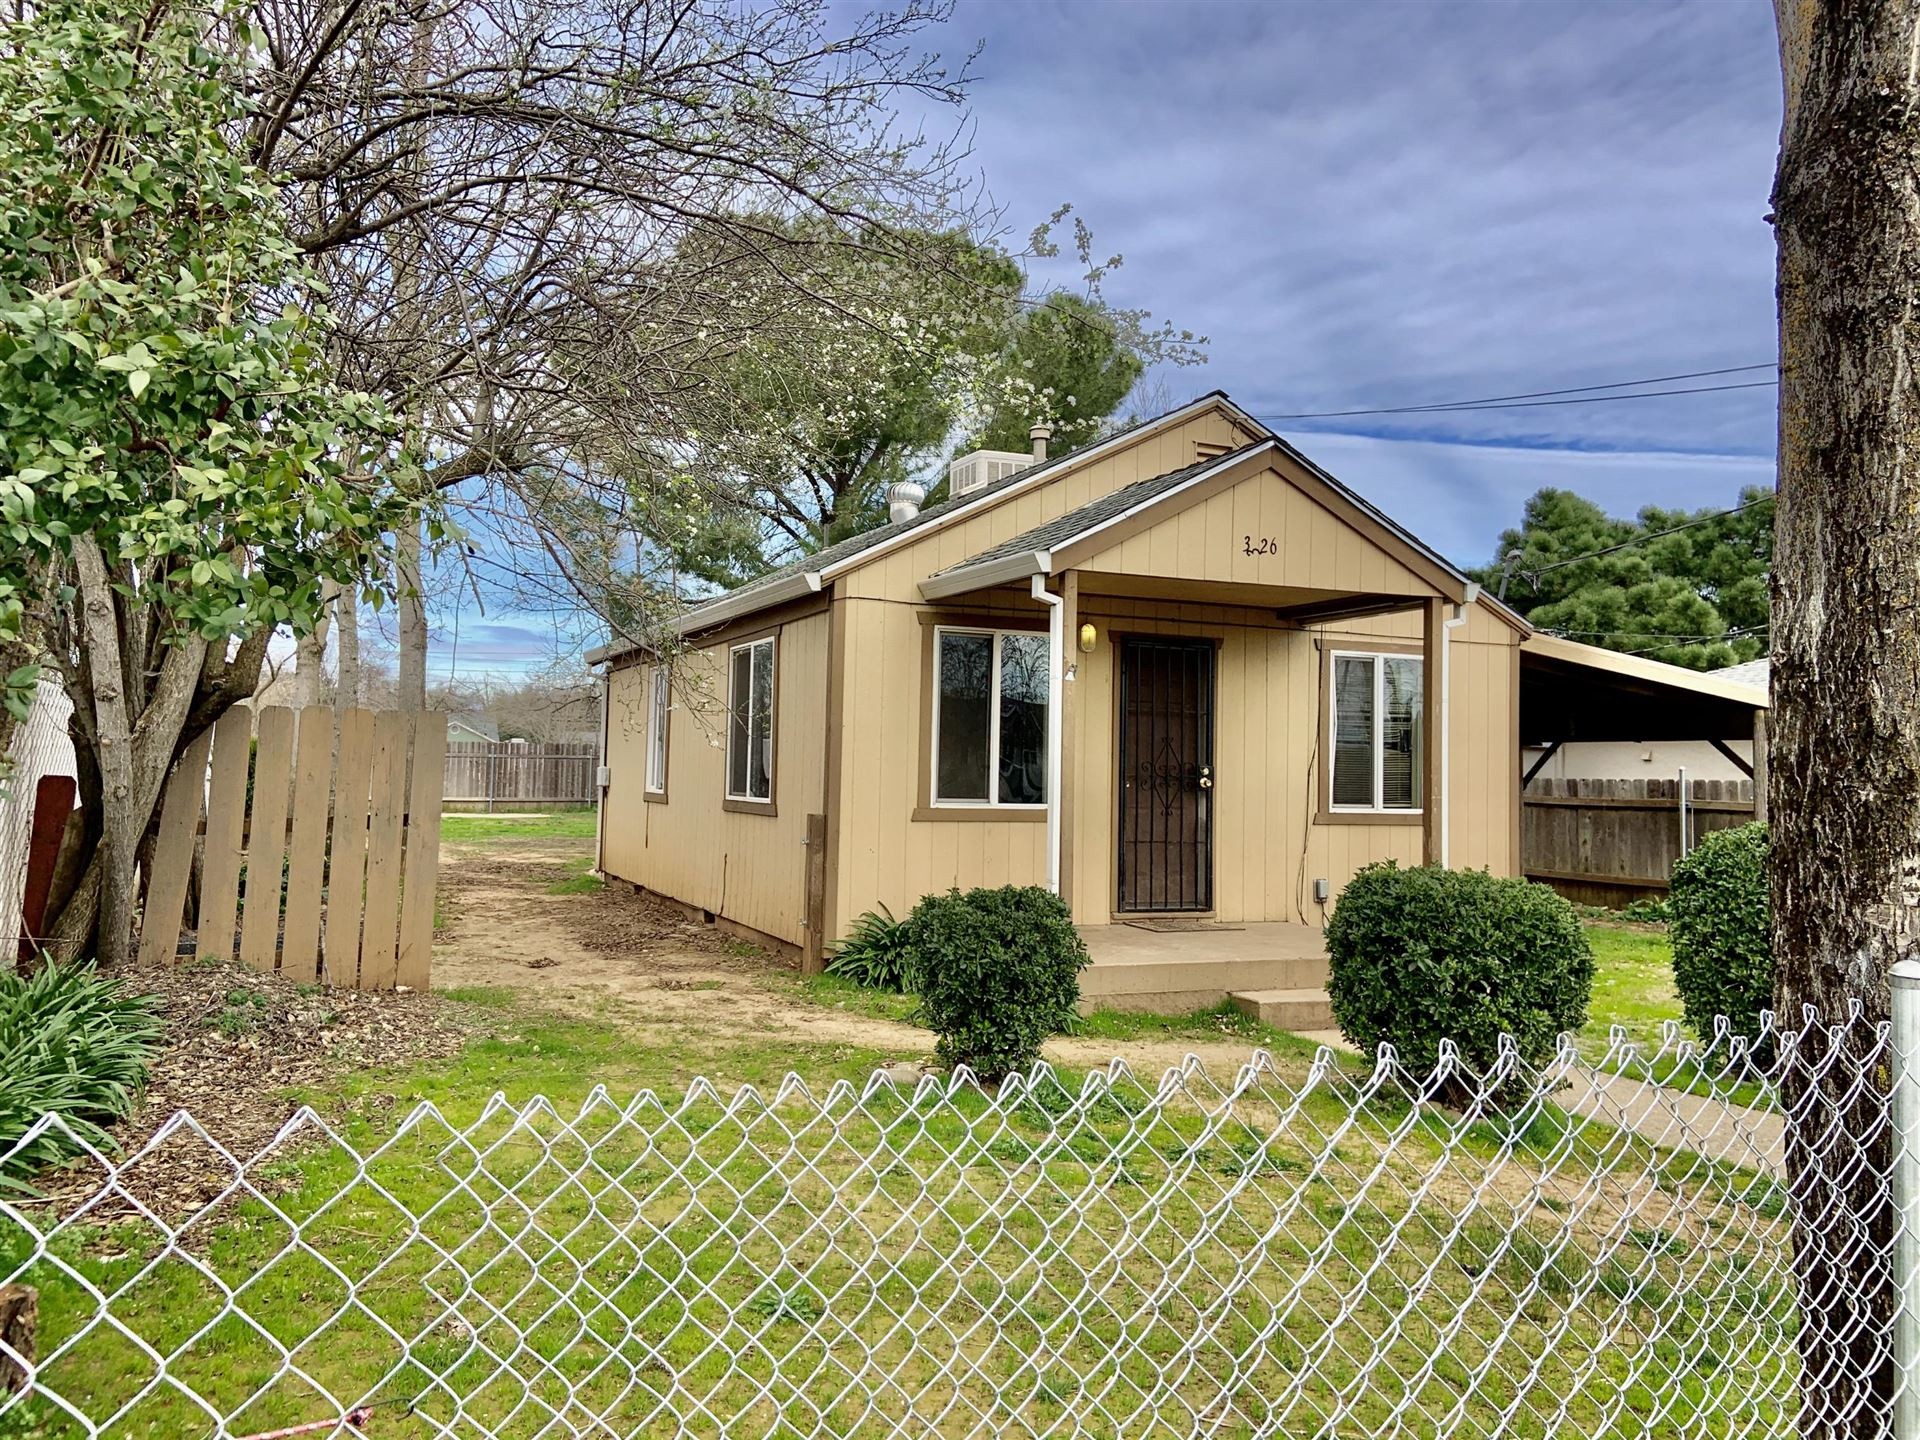 3326 Chestnut St, Cottonwood, CA 96022 - MLS#: 20-773